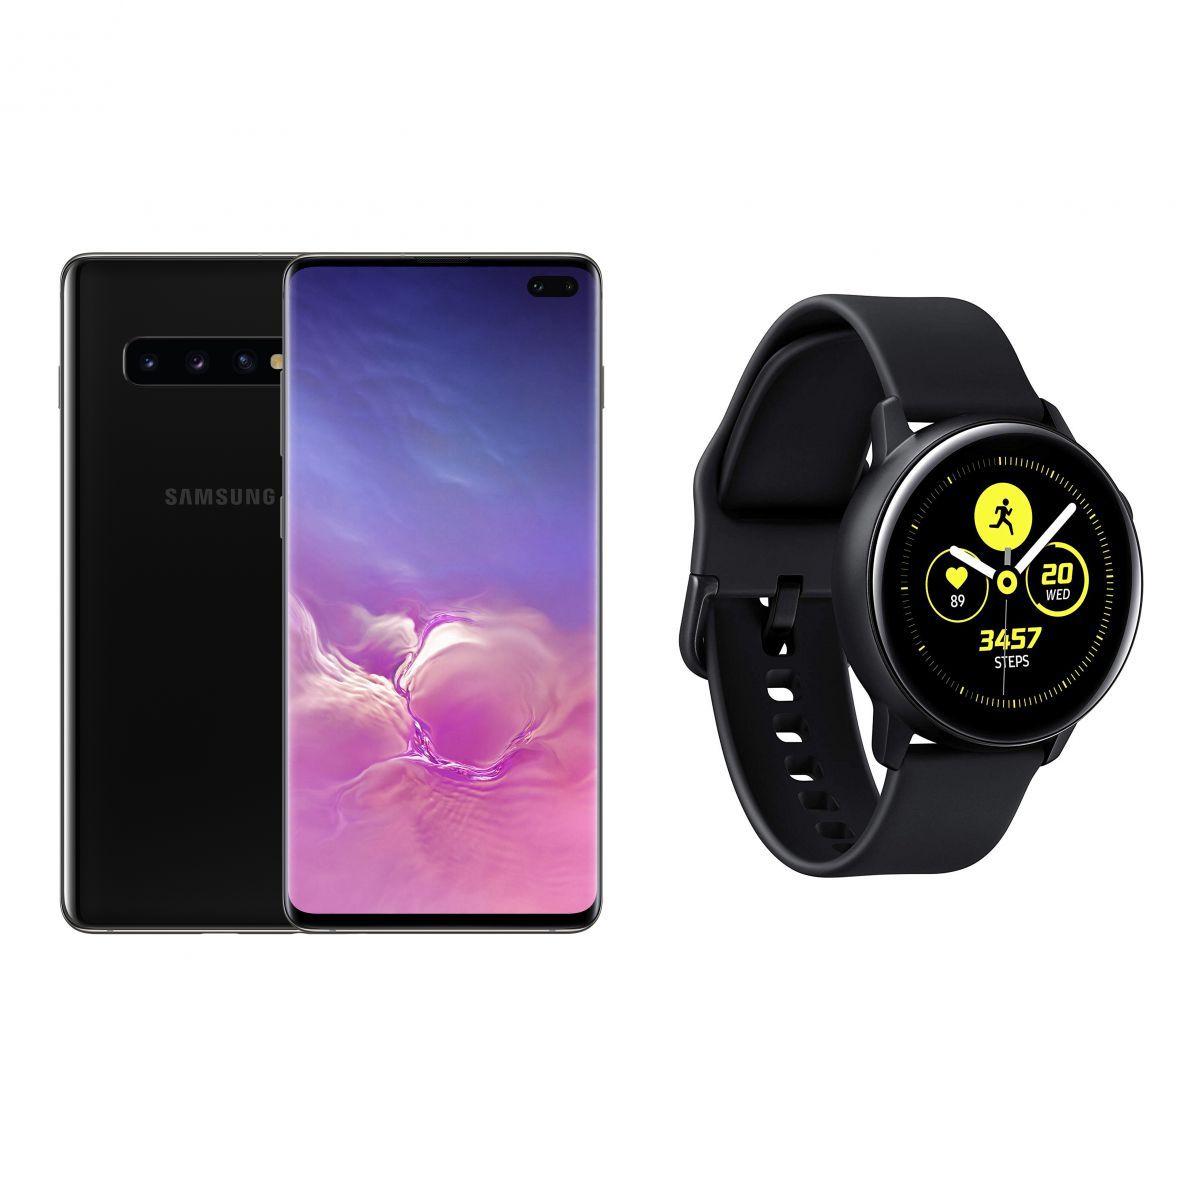 Samsung Galaxy S10+ Black + Free Samsung Galaxy Active 46mm £709.98 @ Amazon